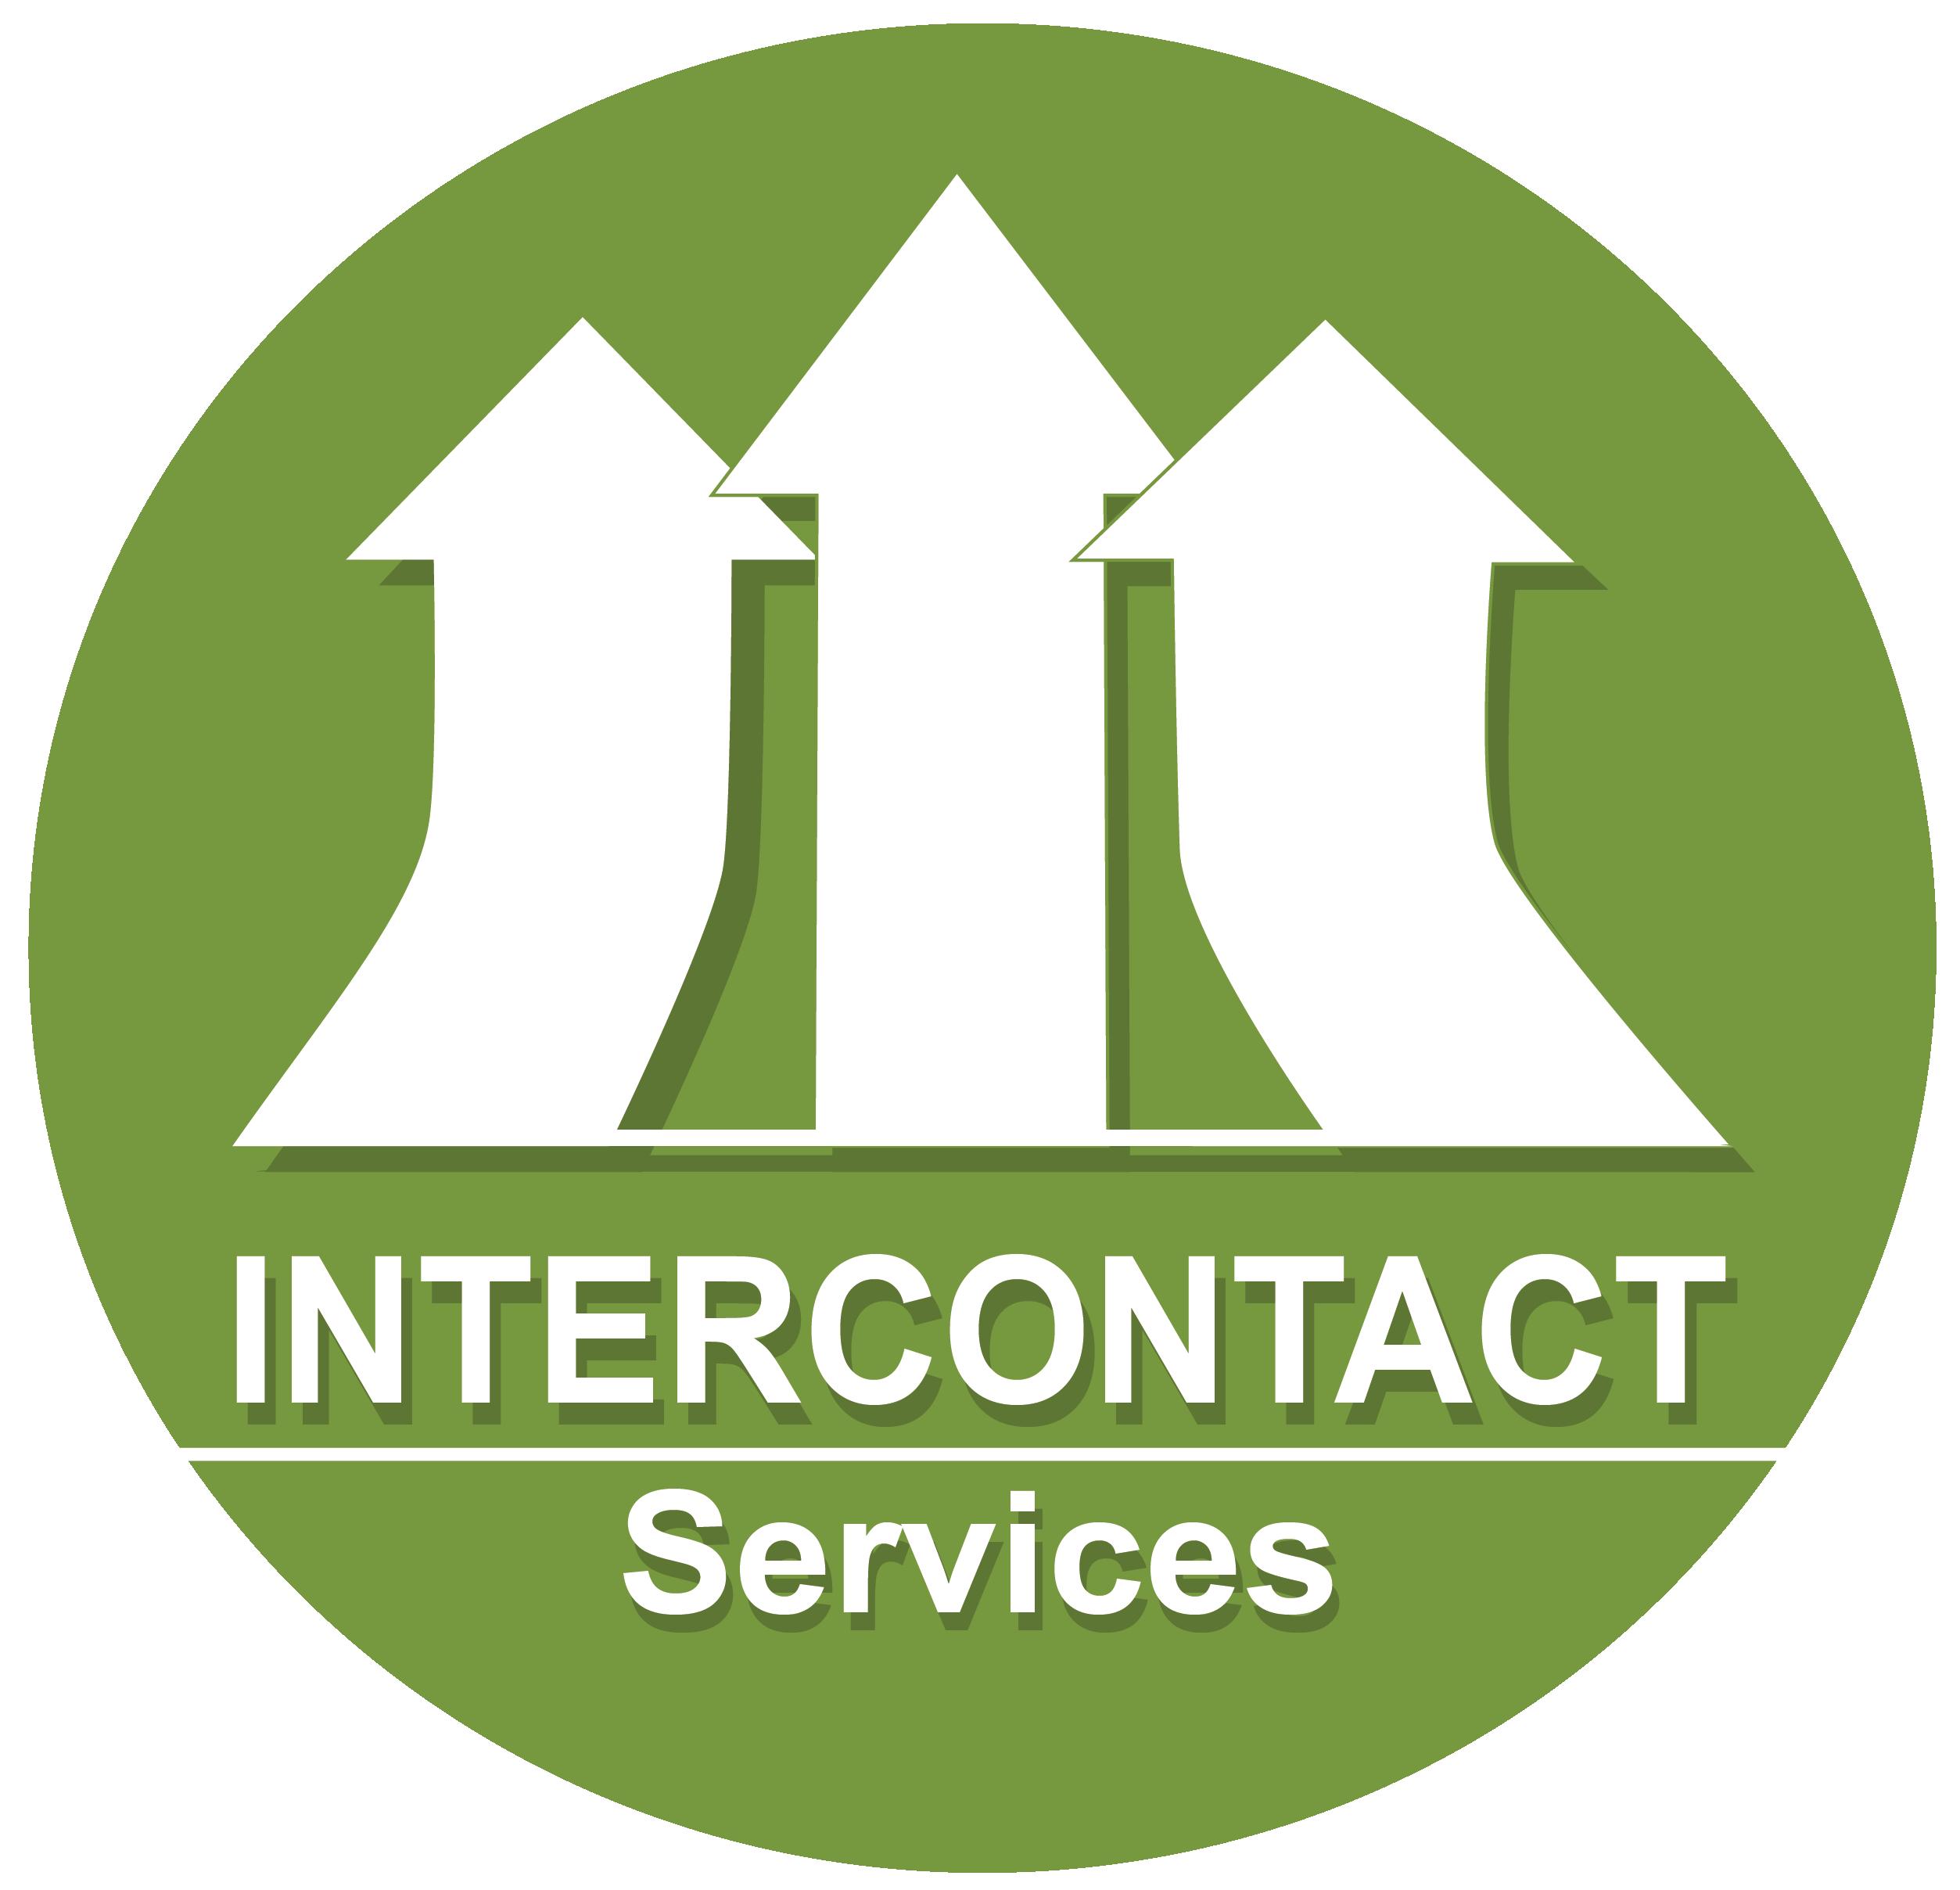 http://www.iwacu-burundi.org/wp-content/uploads/2016/04/Iwacu-web_IntercontactServices_250-x-500.pdf